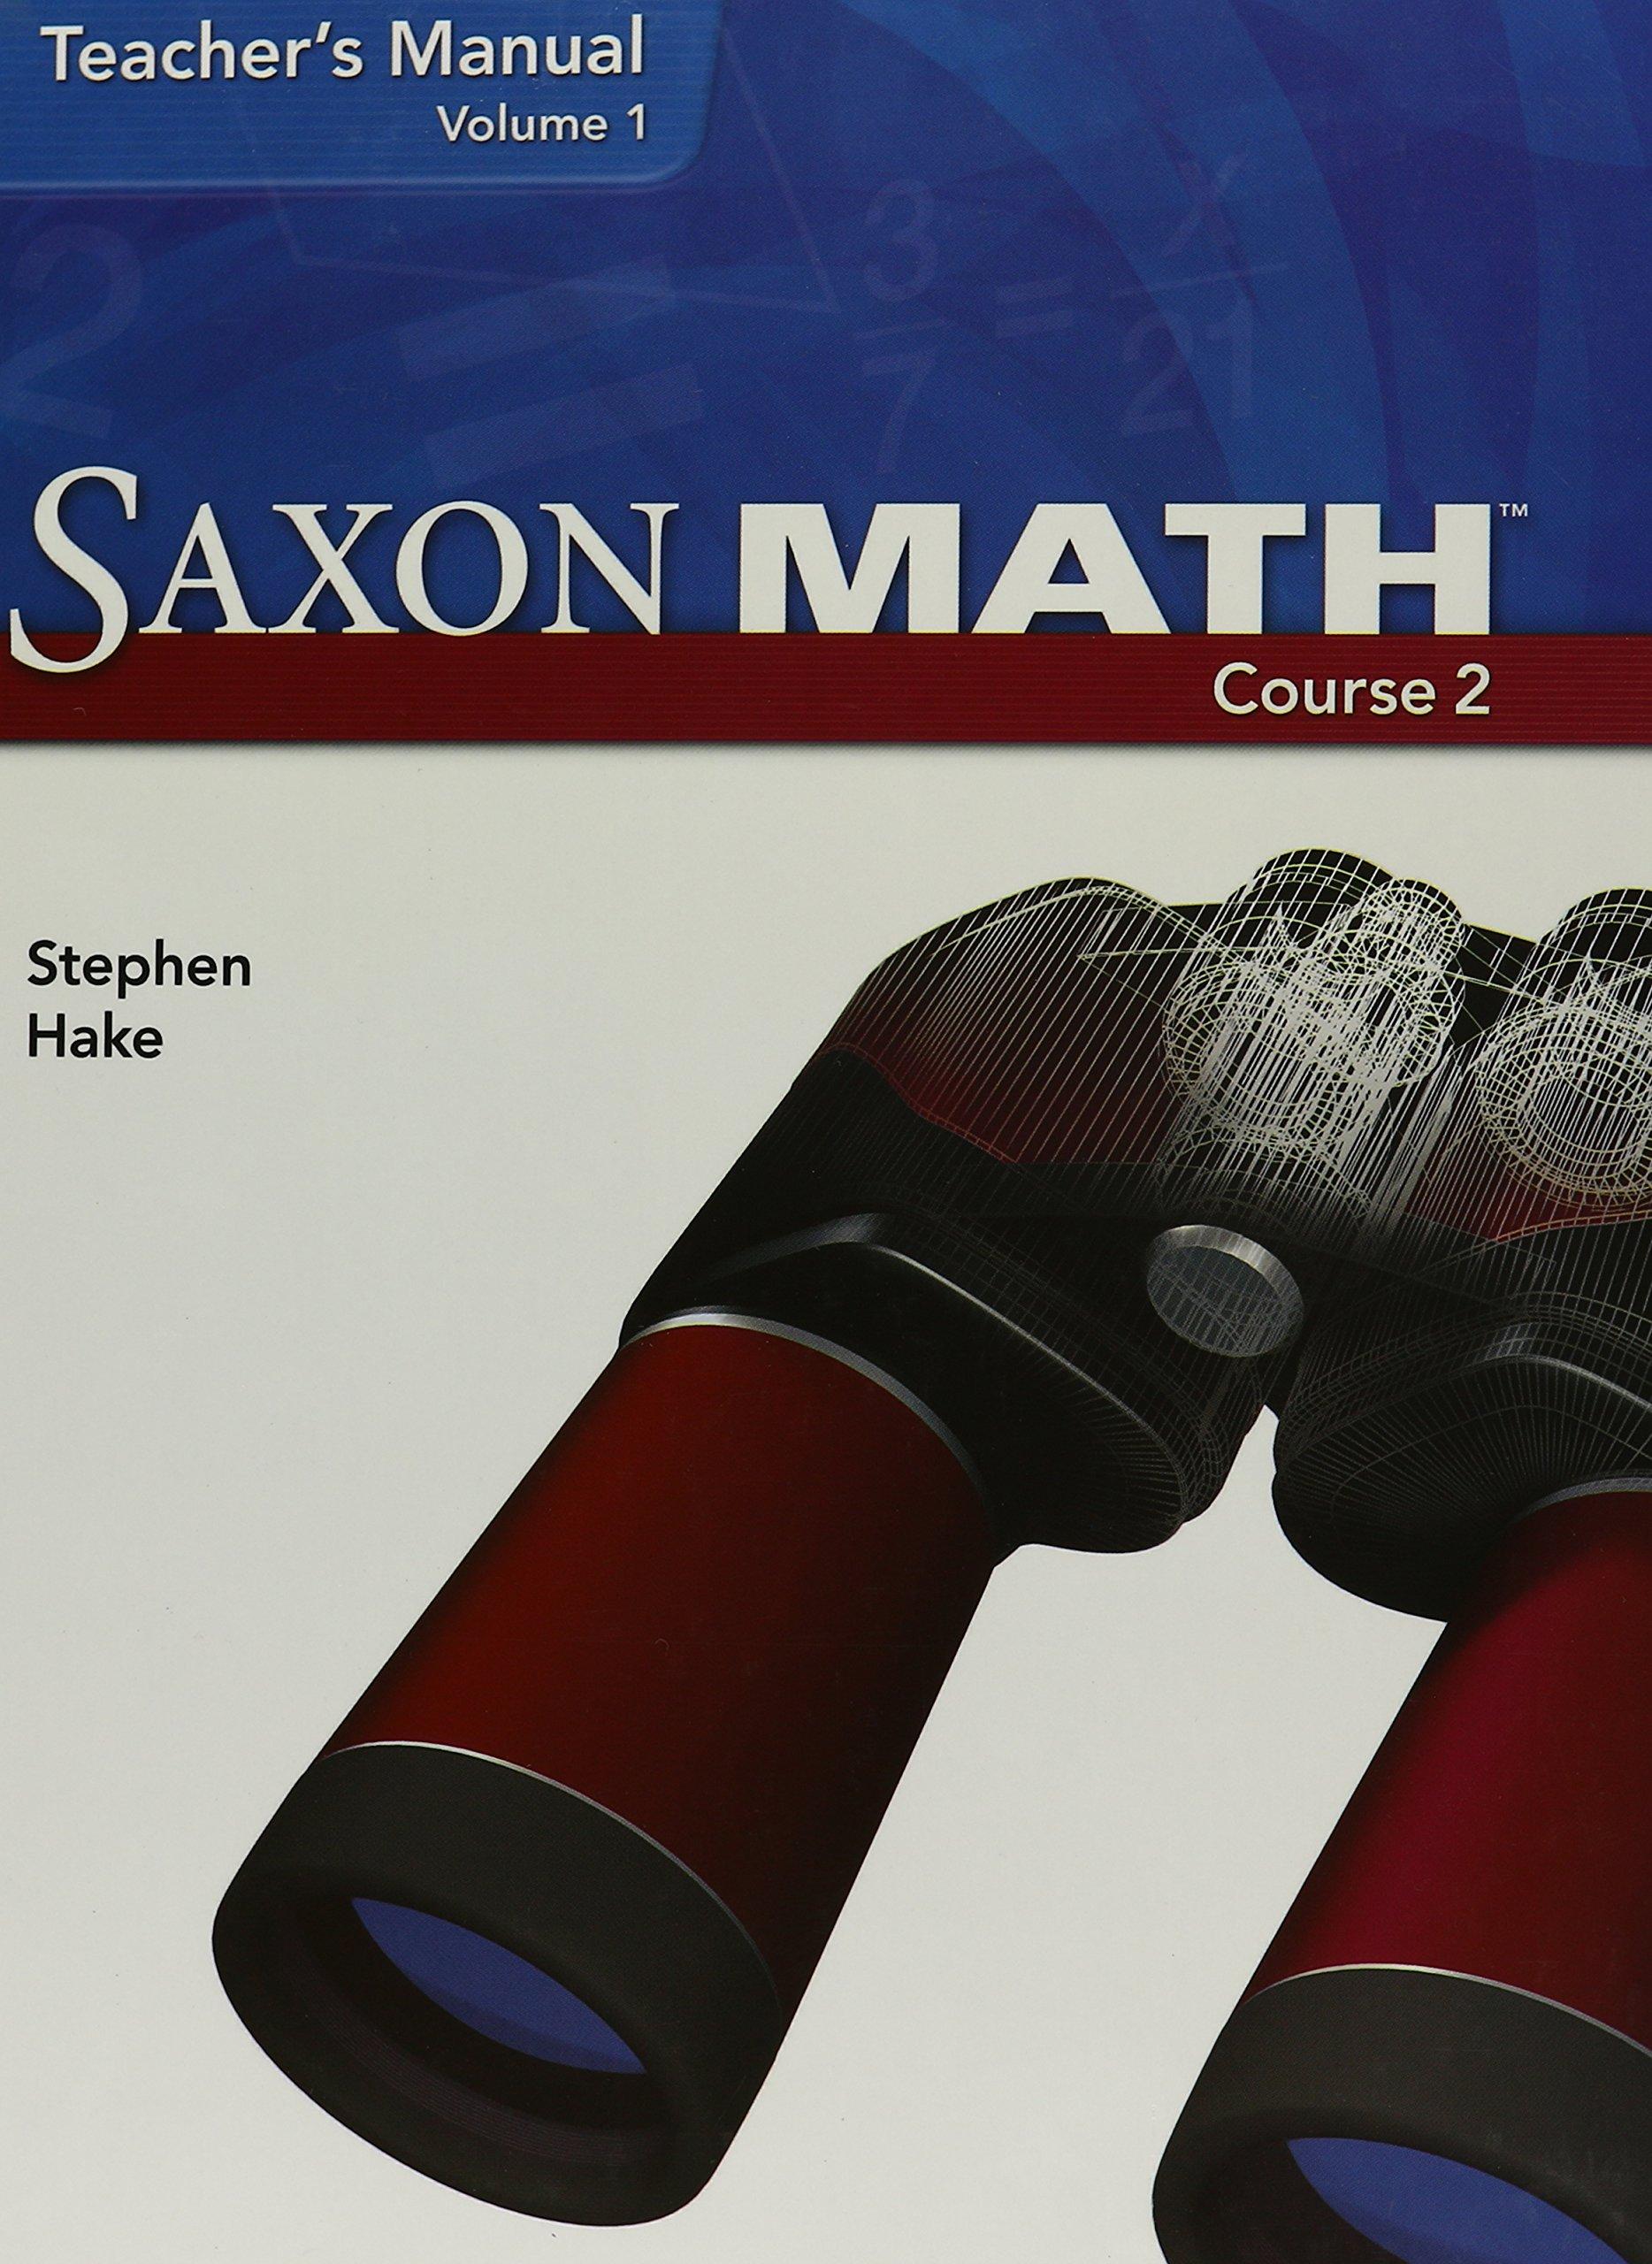 Saxon Math, Course 2, Teacher's Manual, Volume 1, 9781591418375,  1591418372, 2007: Stephen Hake: 9781591418375: Amazon.com: Books